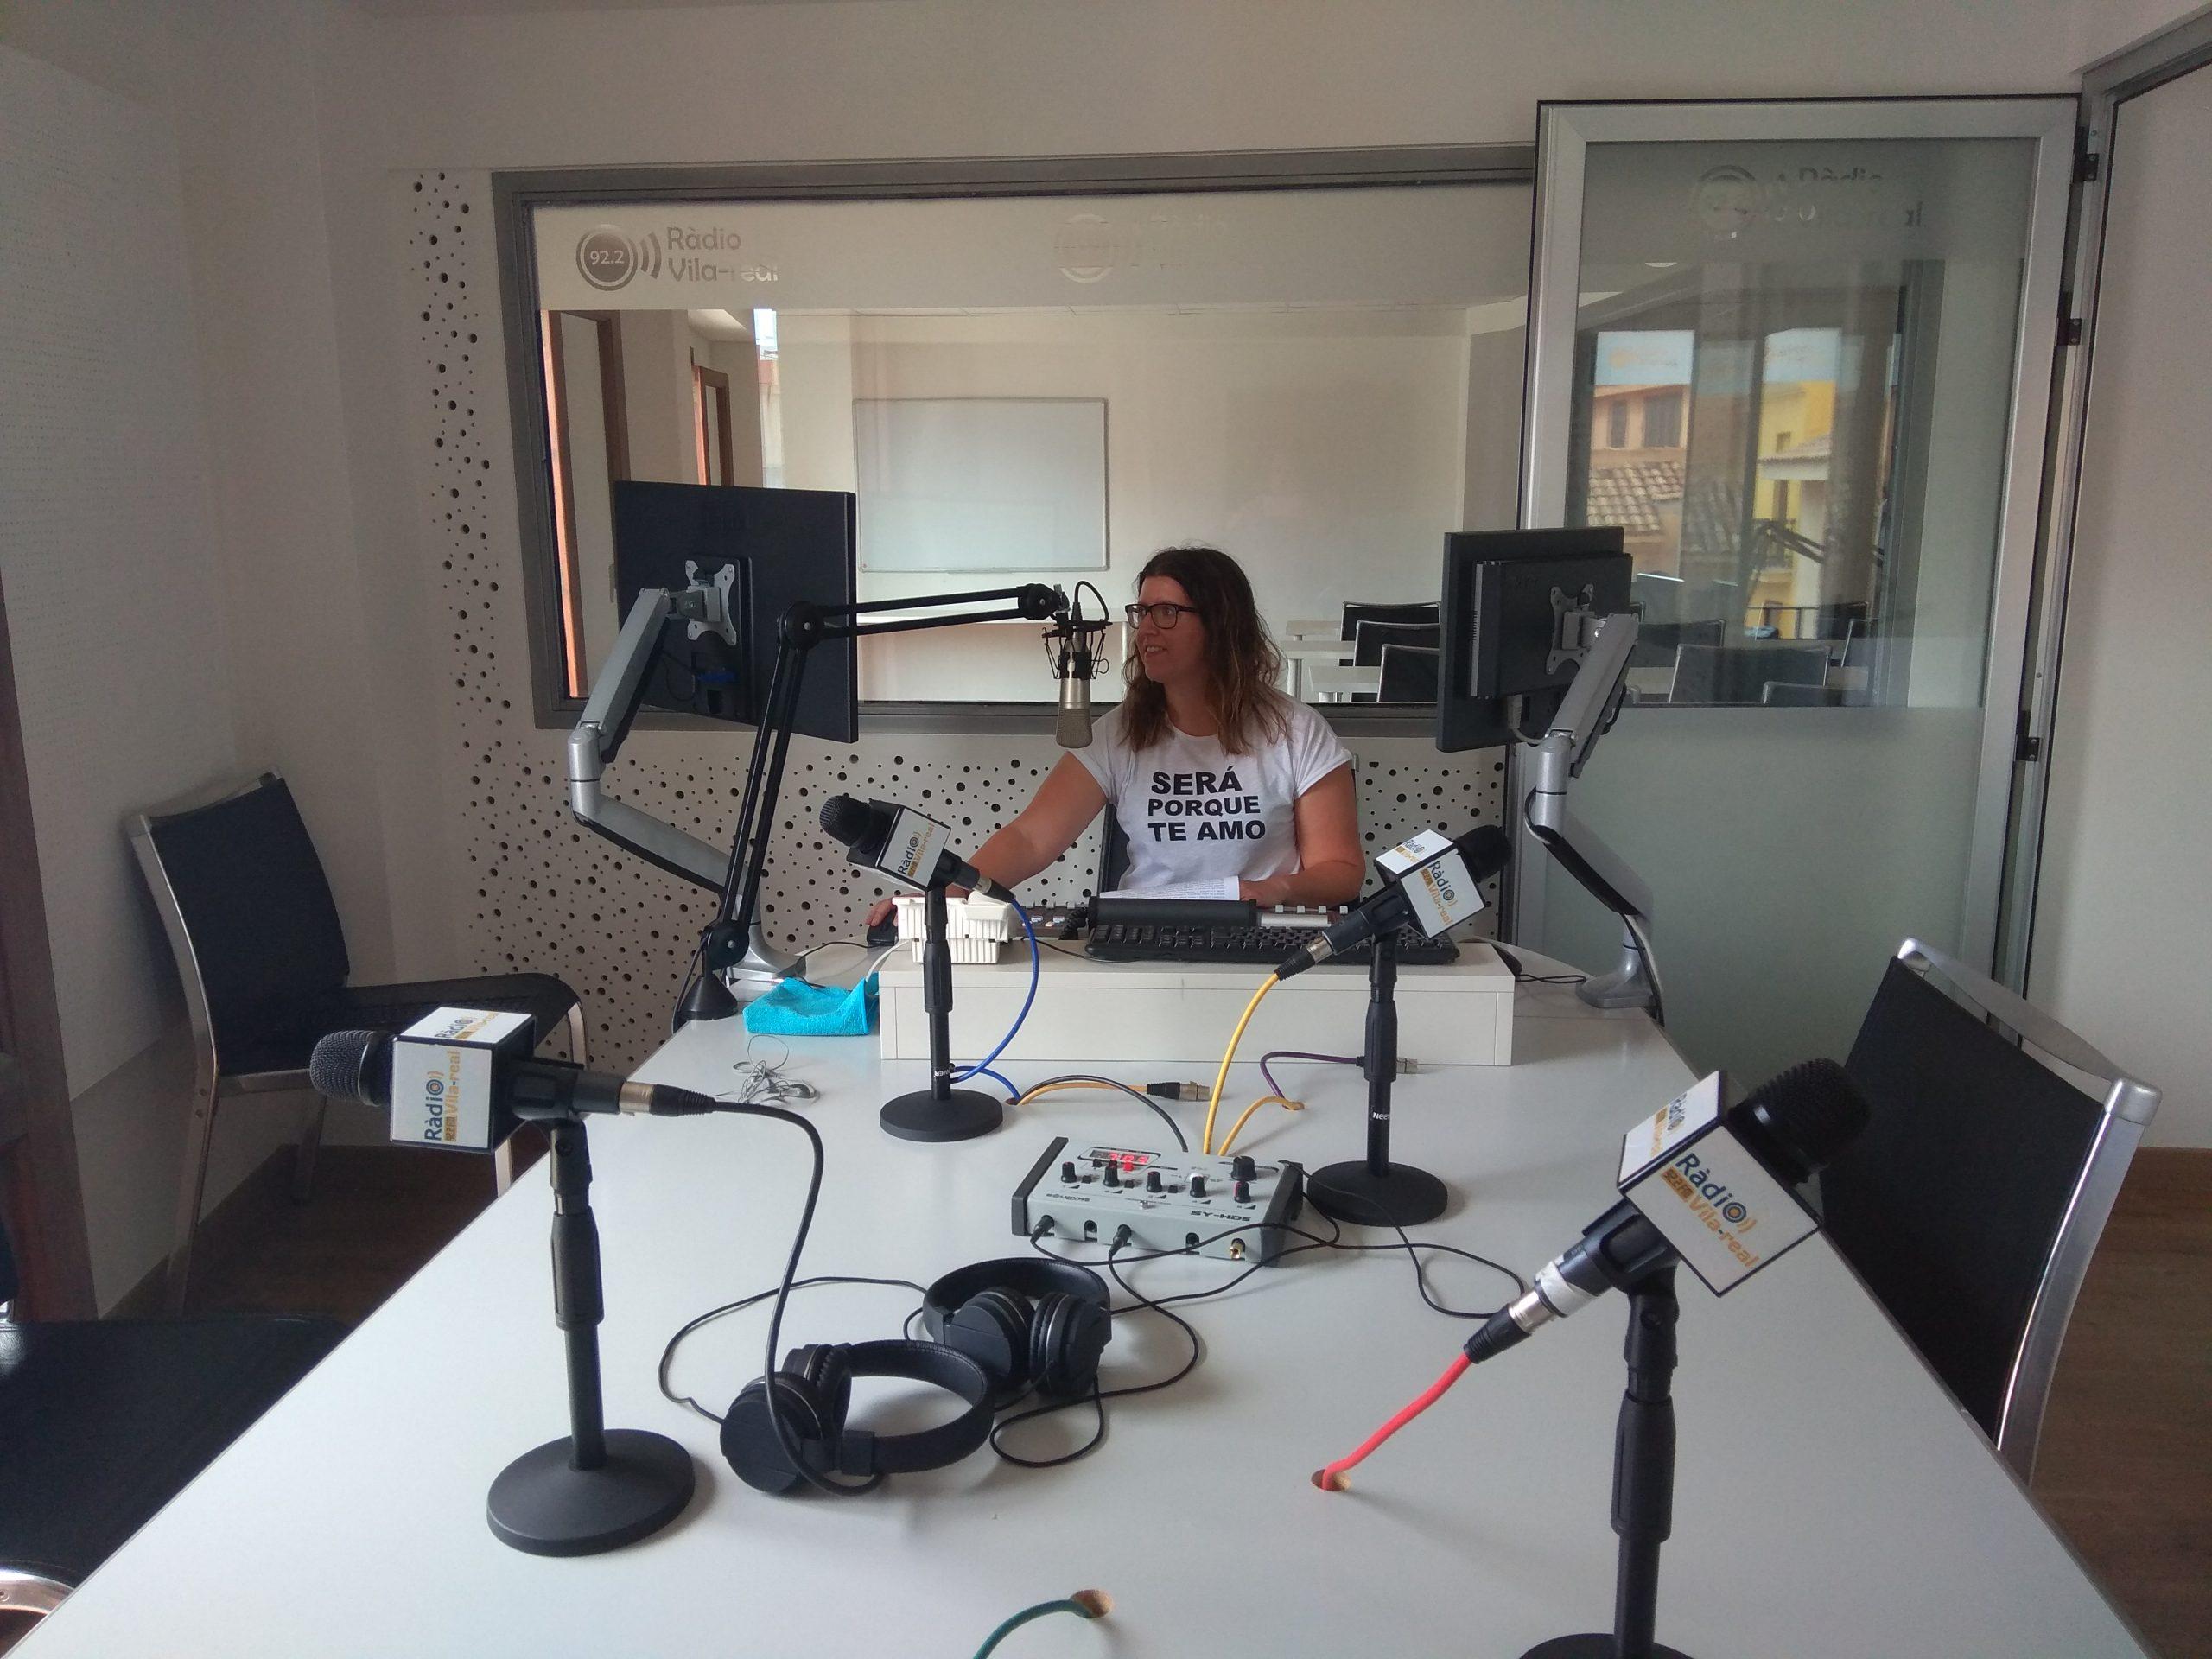 Programa completo 'Protagonistes Vila-real' miércoles 17 de junio de 2020